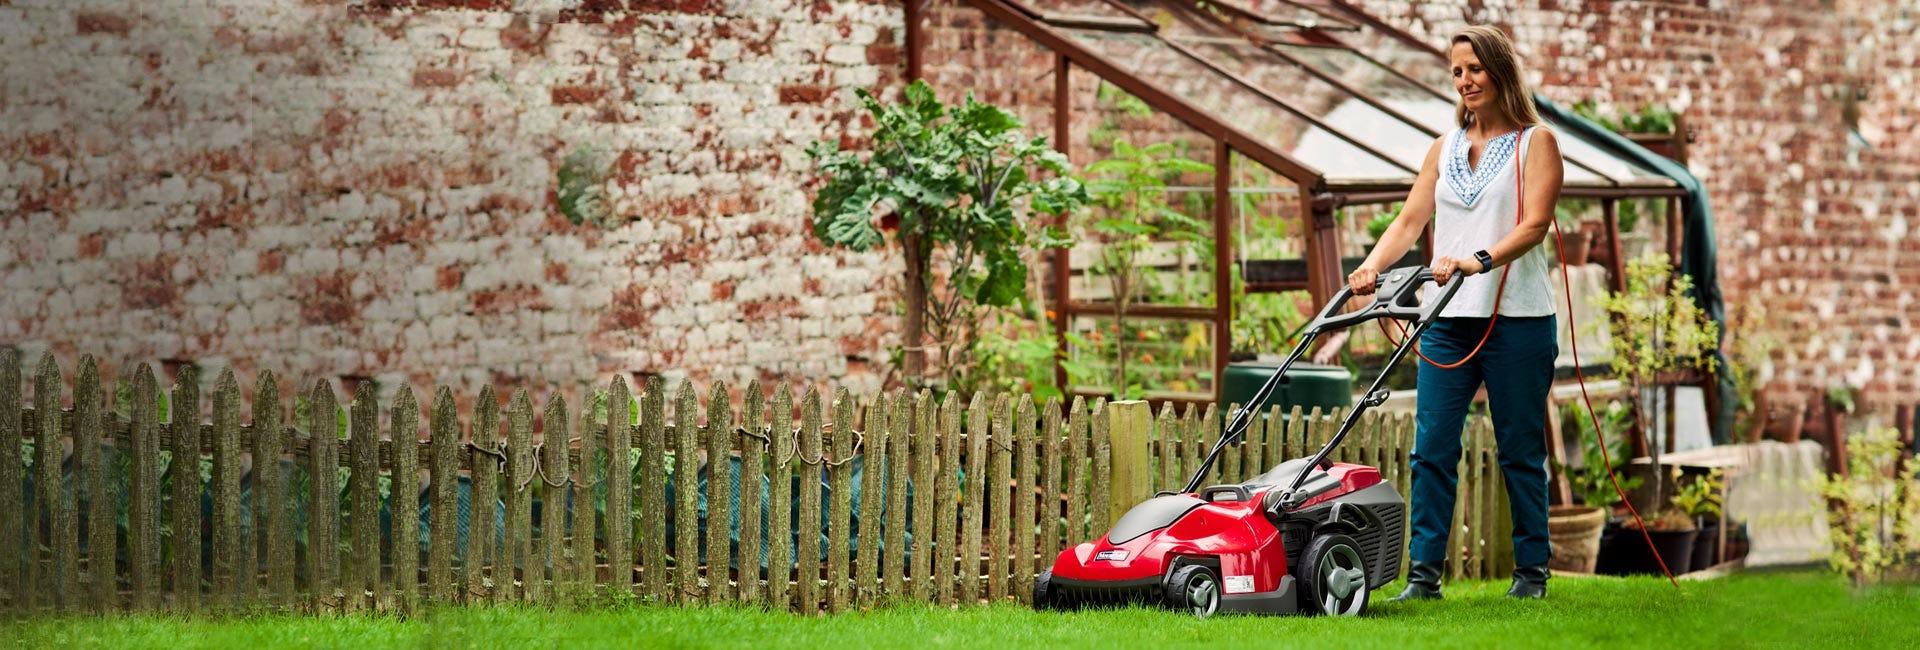 Electric Lawnmowers